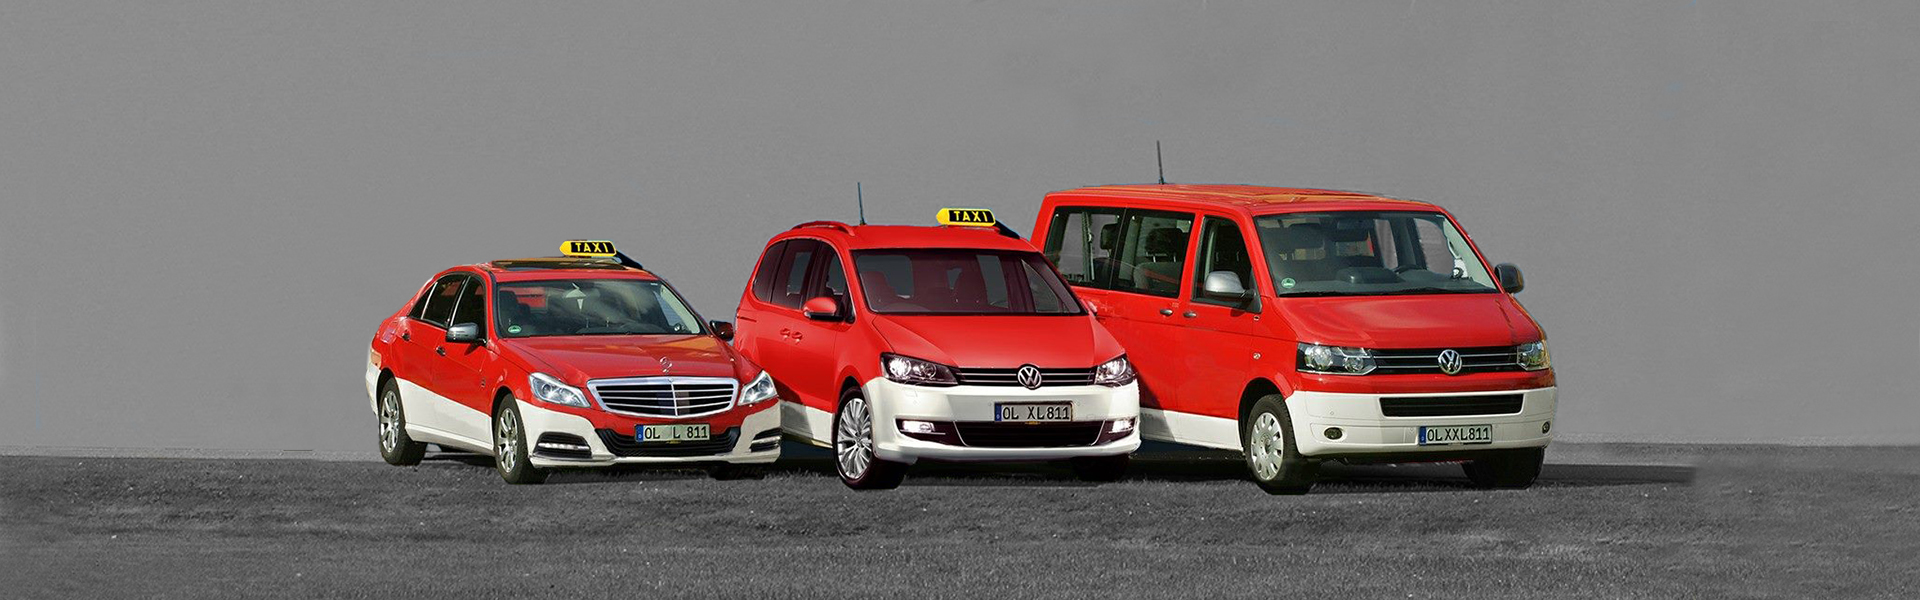 ACHT-ELF-ELF Taxi Fahrzeuge